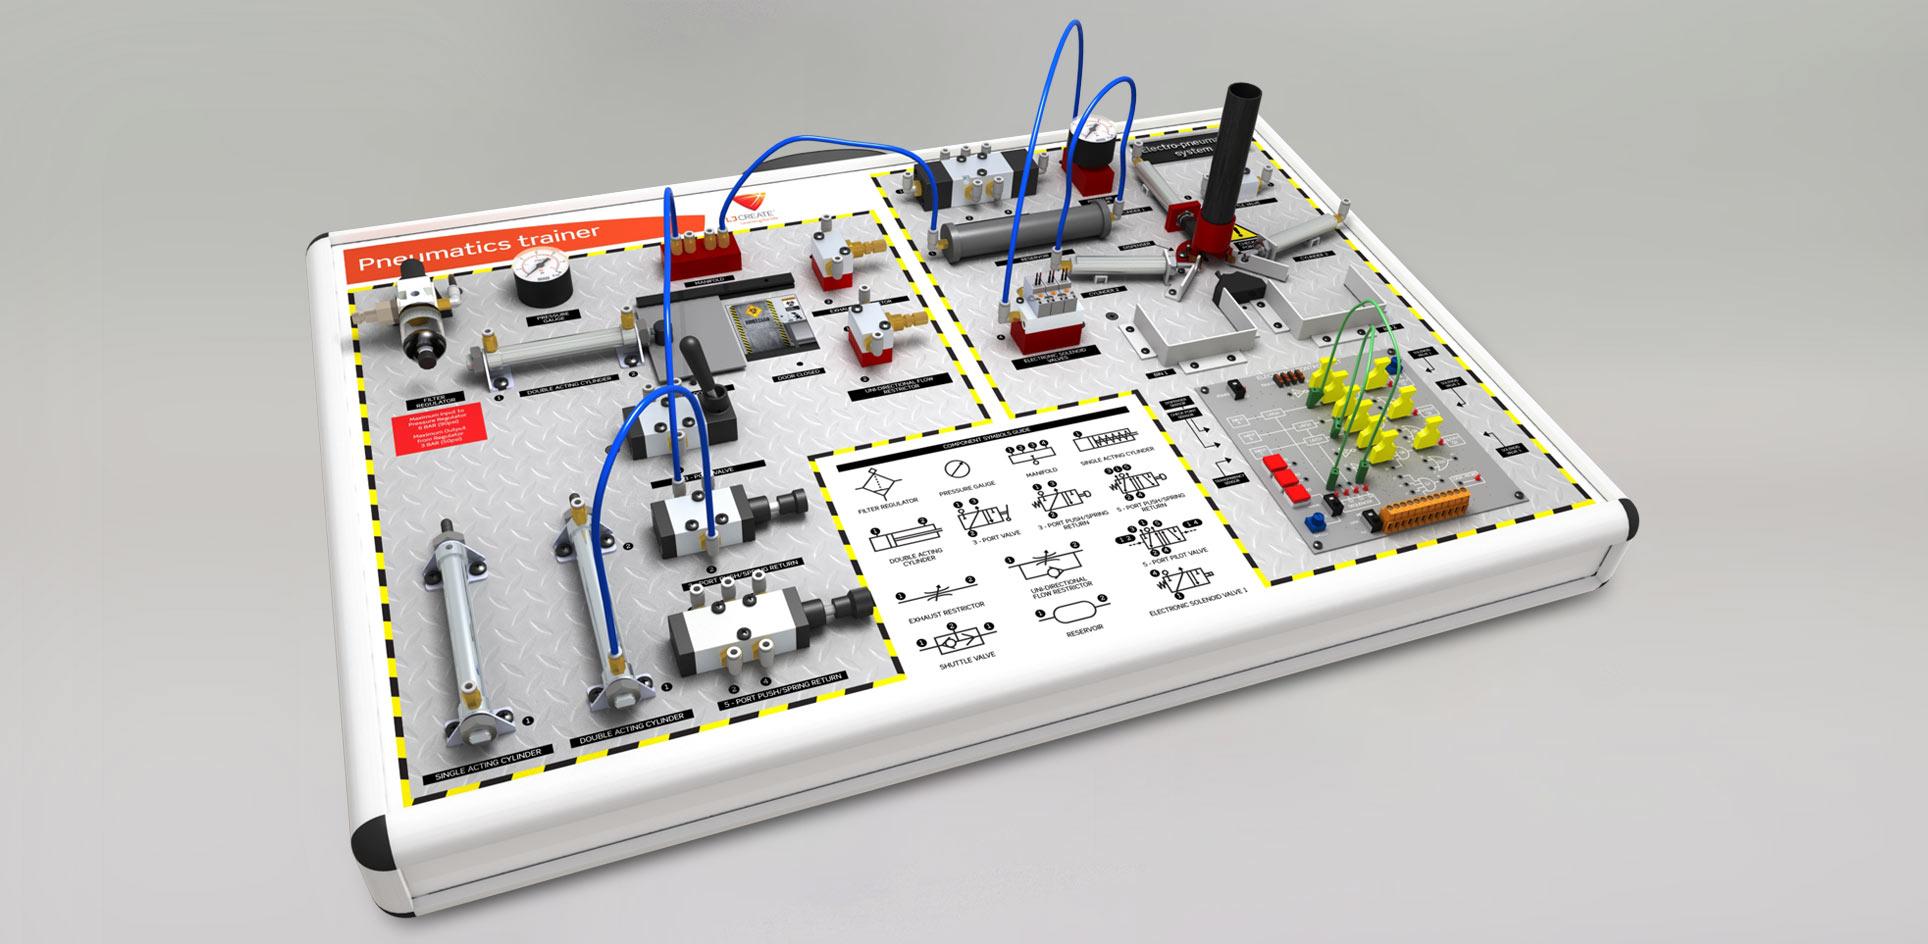 Electro-Pneumatics Trainer Image